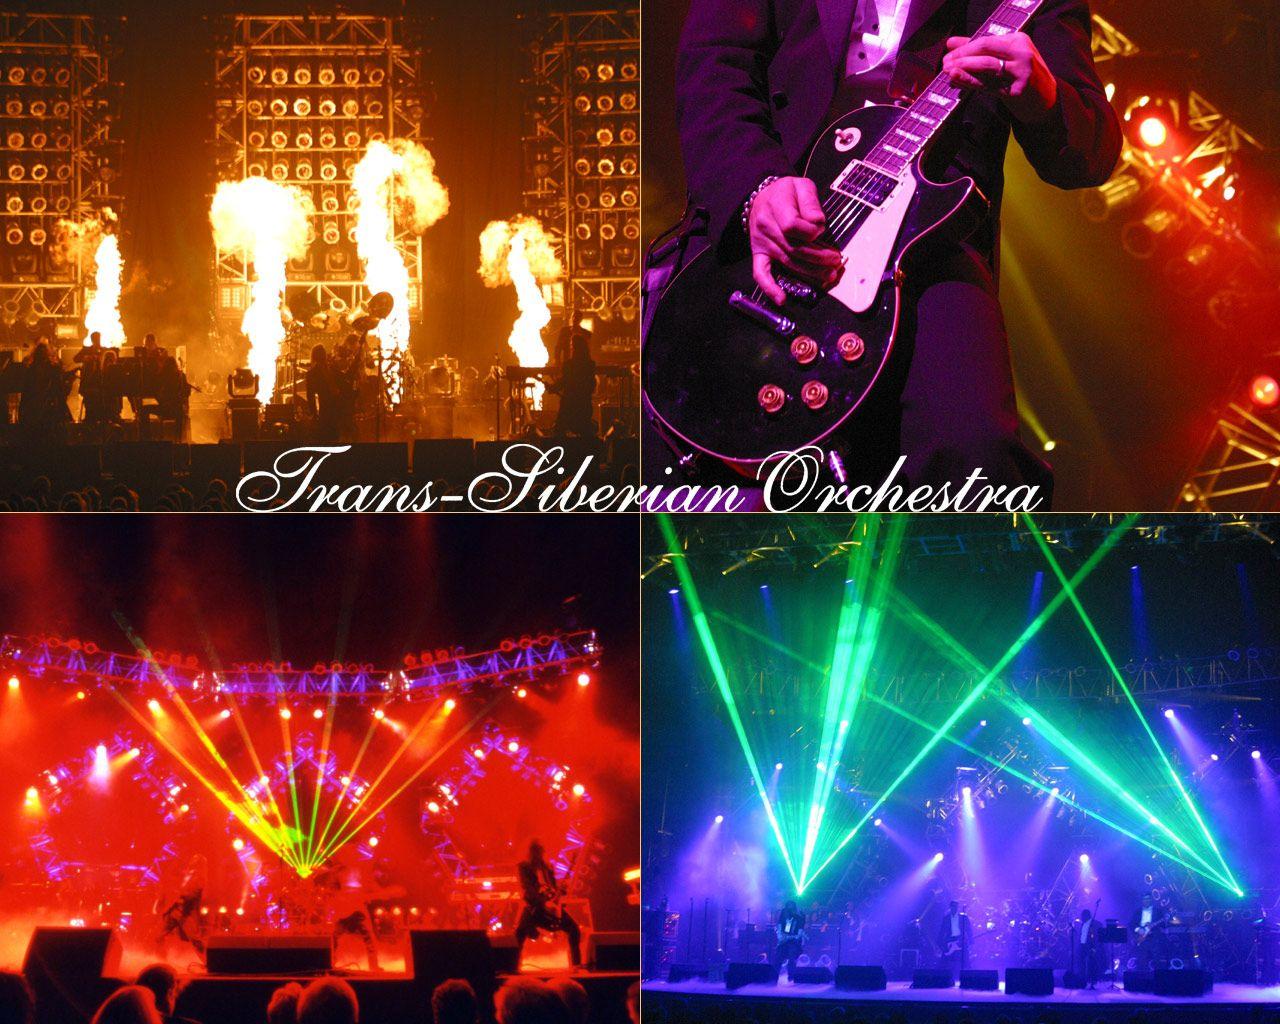 Trans Siberian Orchestra | Music <3 | Pinterest | Orchestra, Trans ...